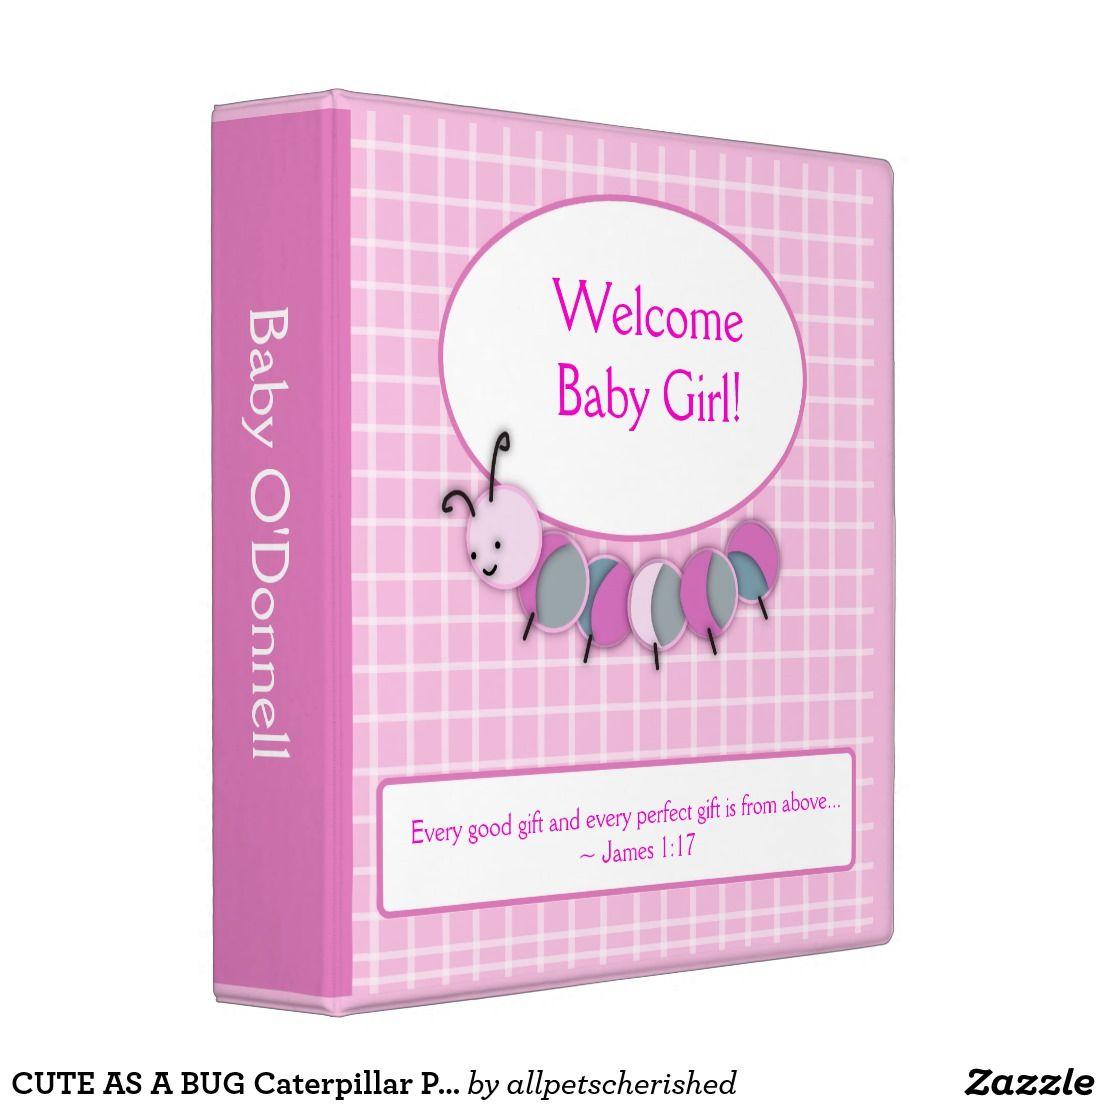 CUTE AS A BUG Caterpillar Photo Album Baby Book Binder